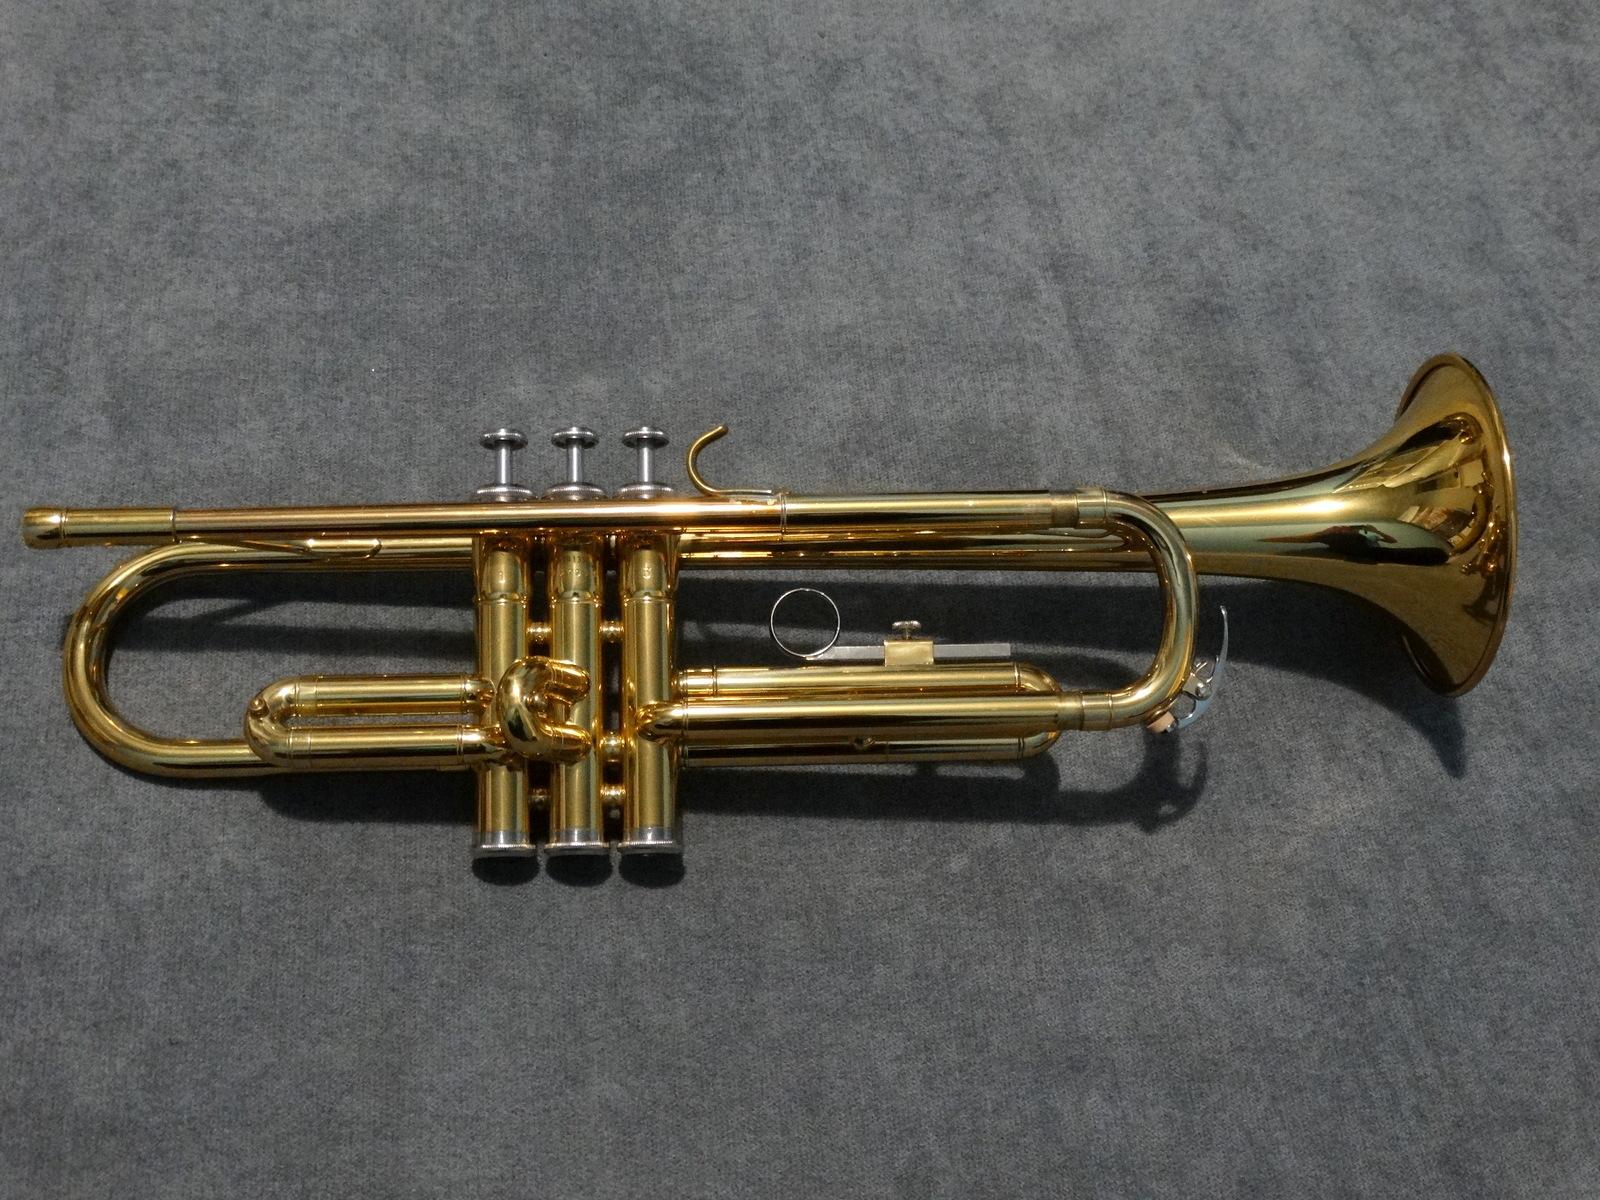 YAMAHA 1335 - Made in JAPAN